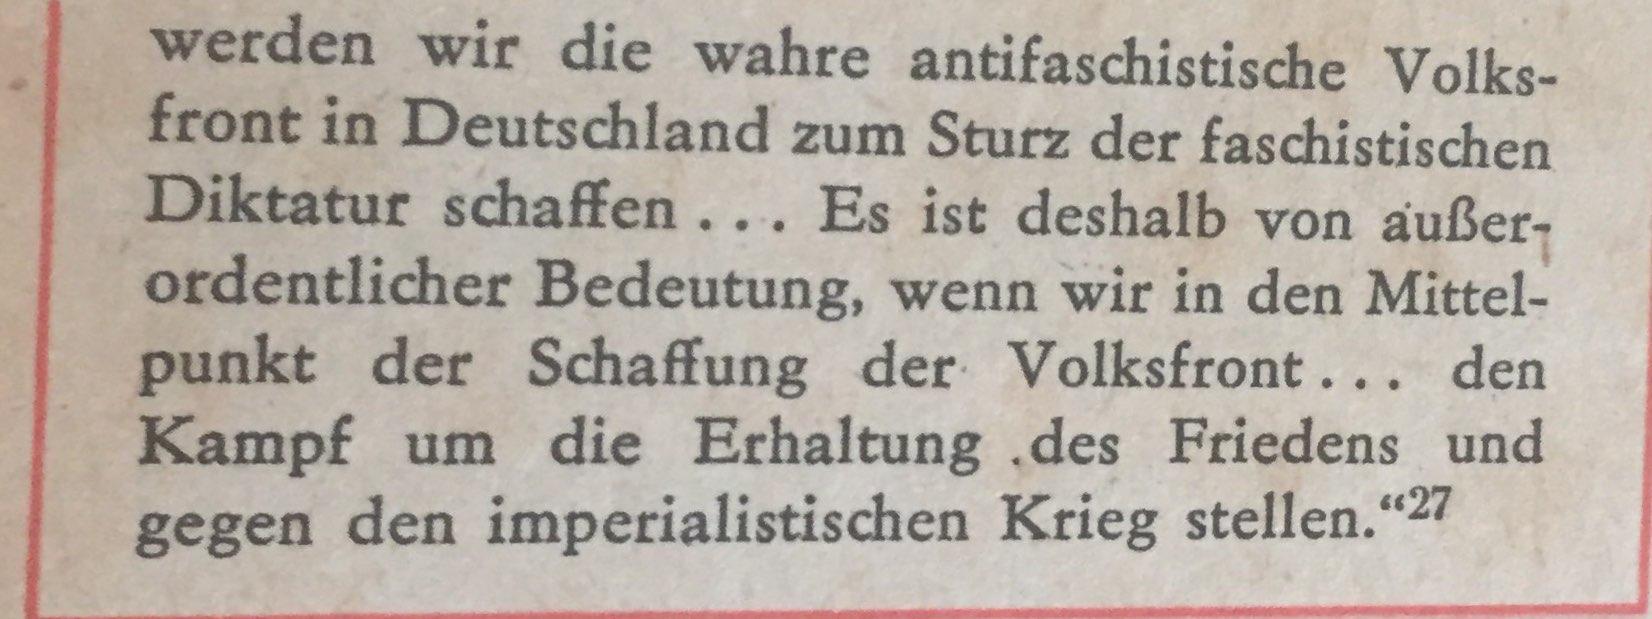 Wilhelm Pieck über Volksfront 2